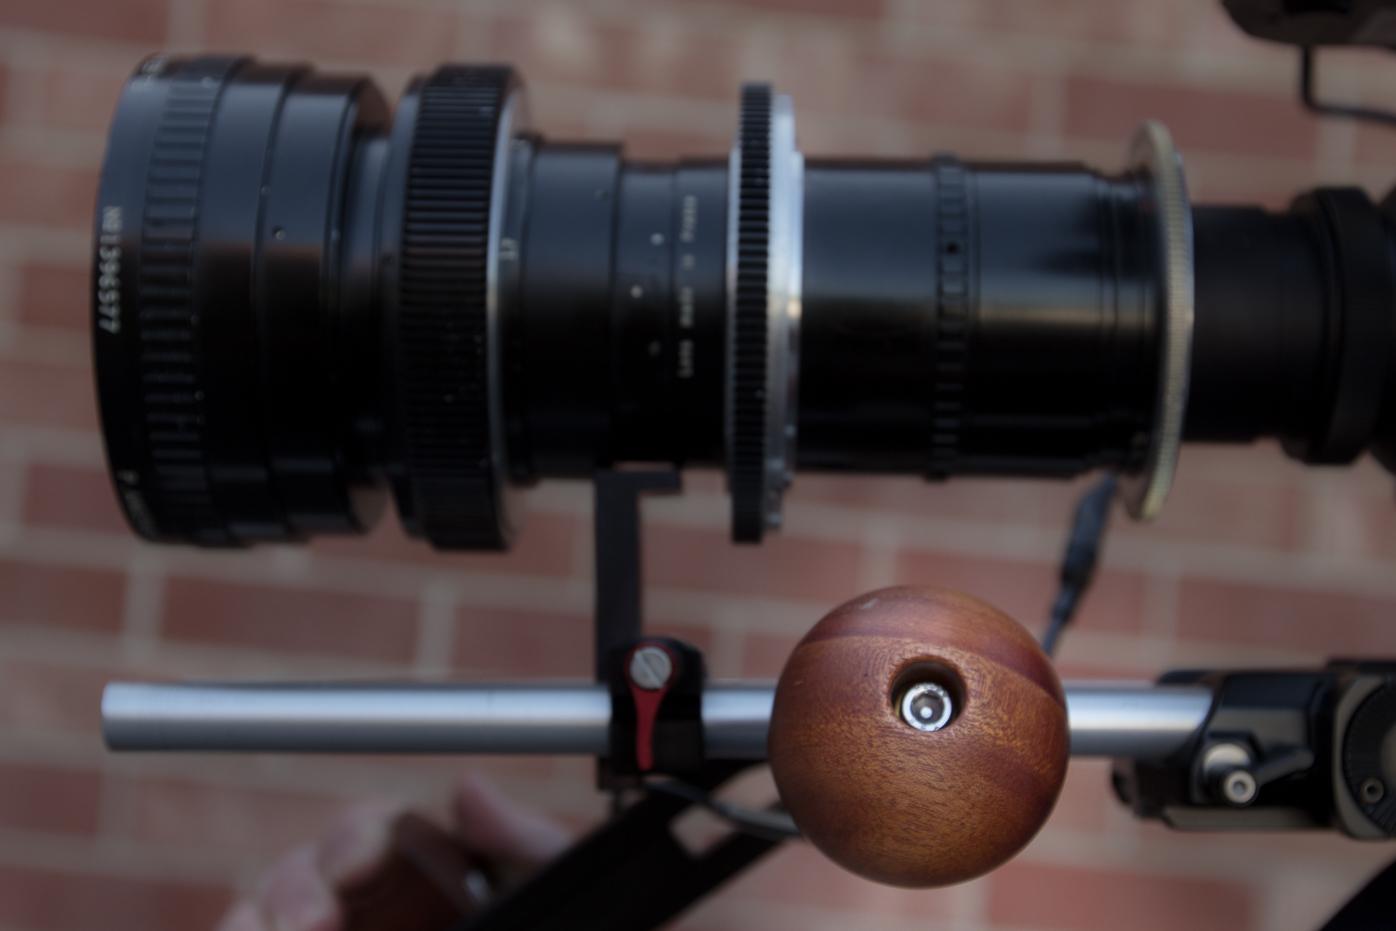 KinoGrip